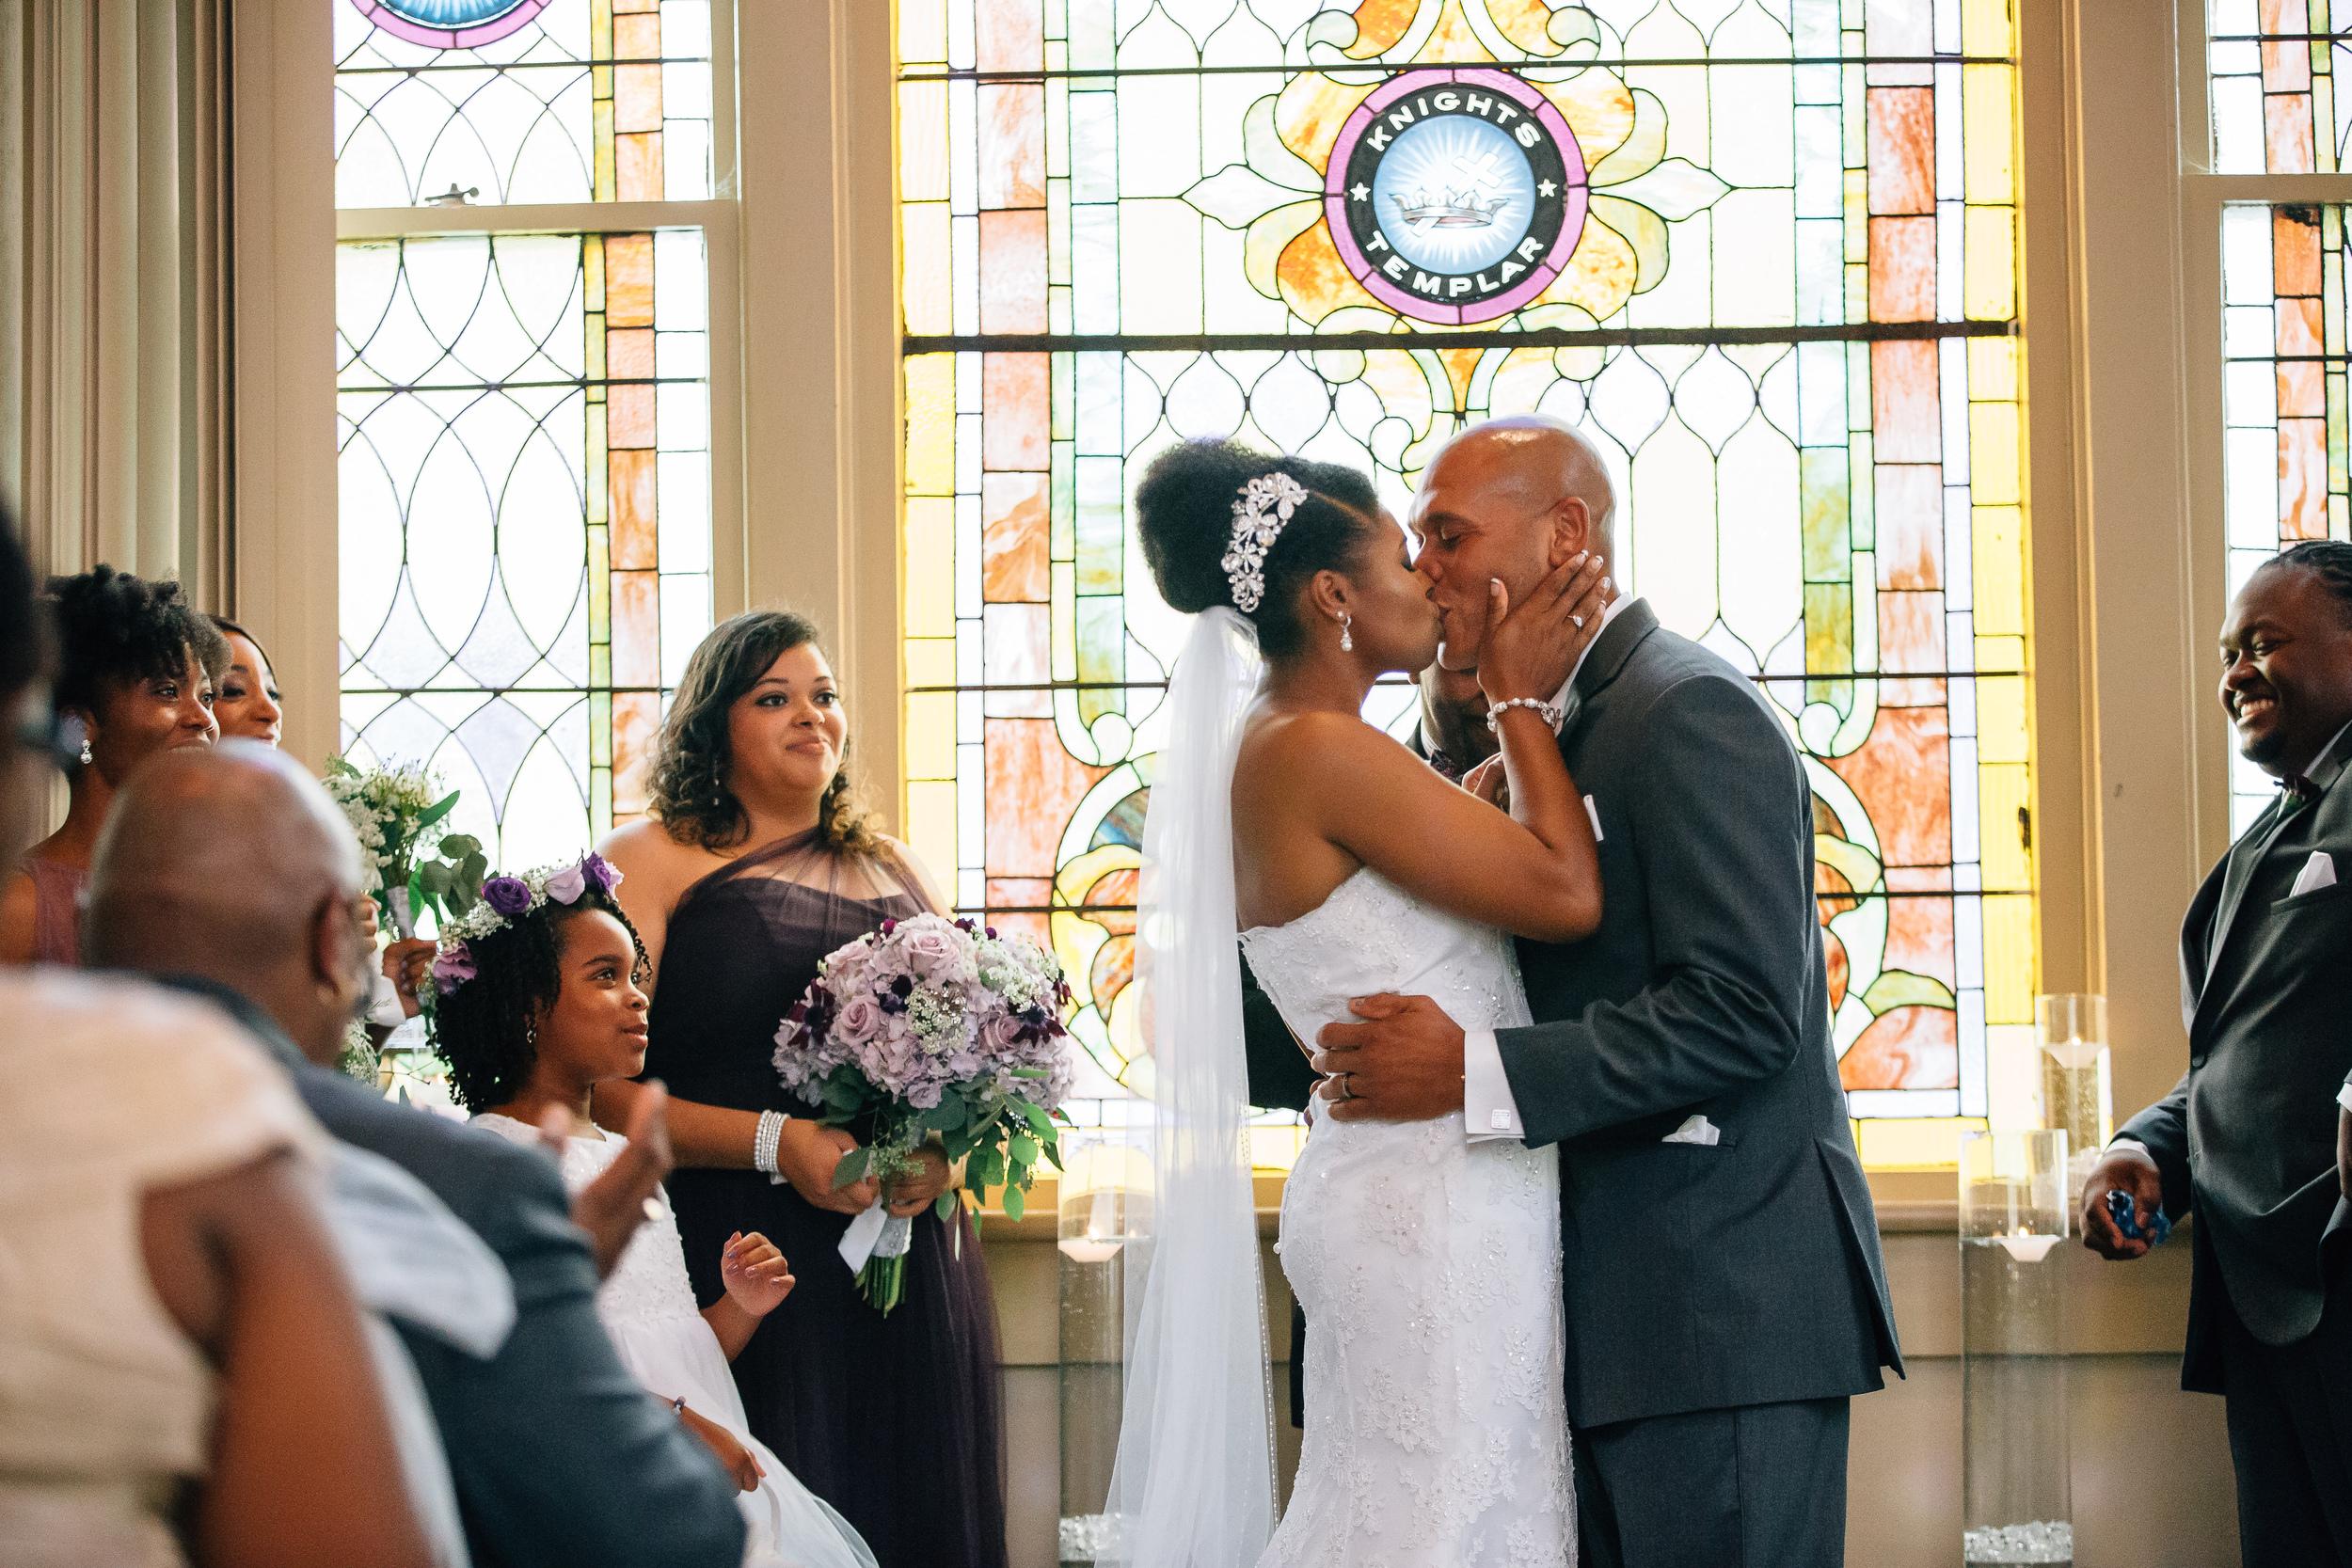 Chuck & Alicia's Wedding - Corrie Mick Photography-298.jpg